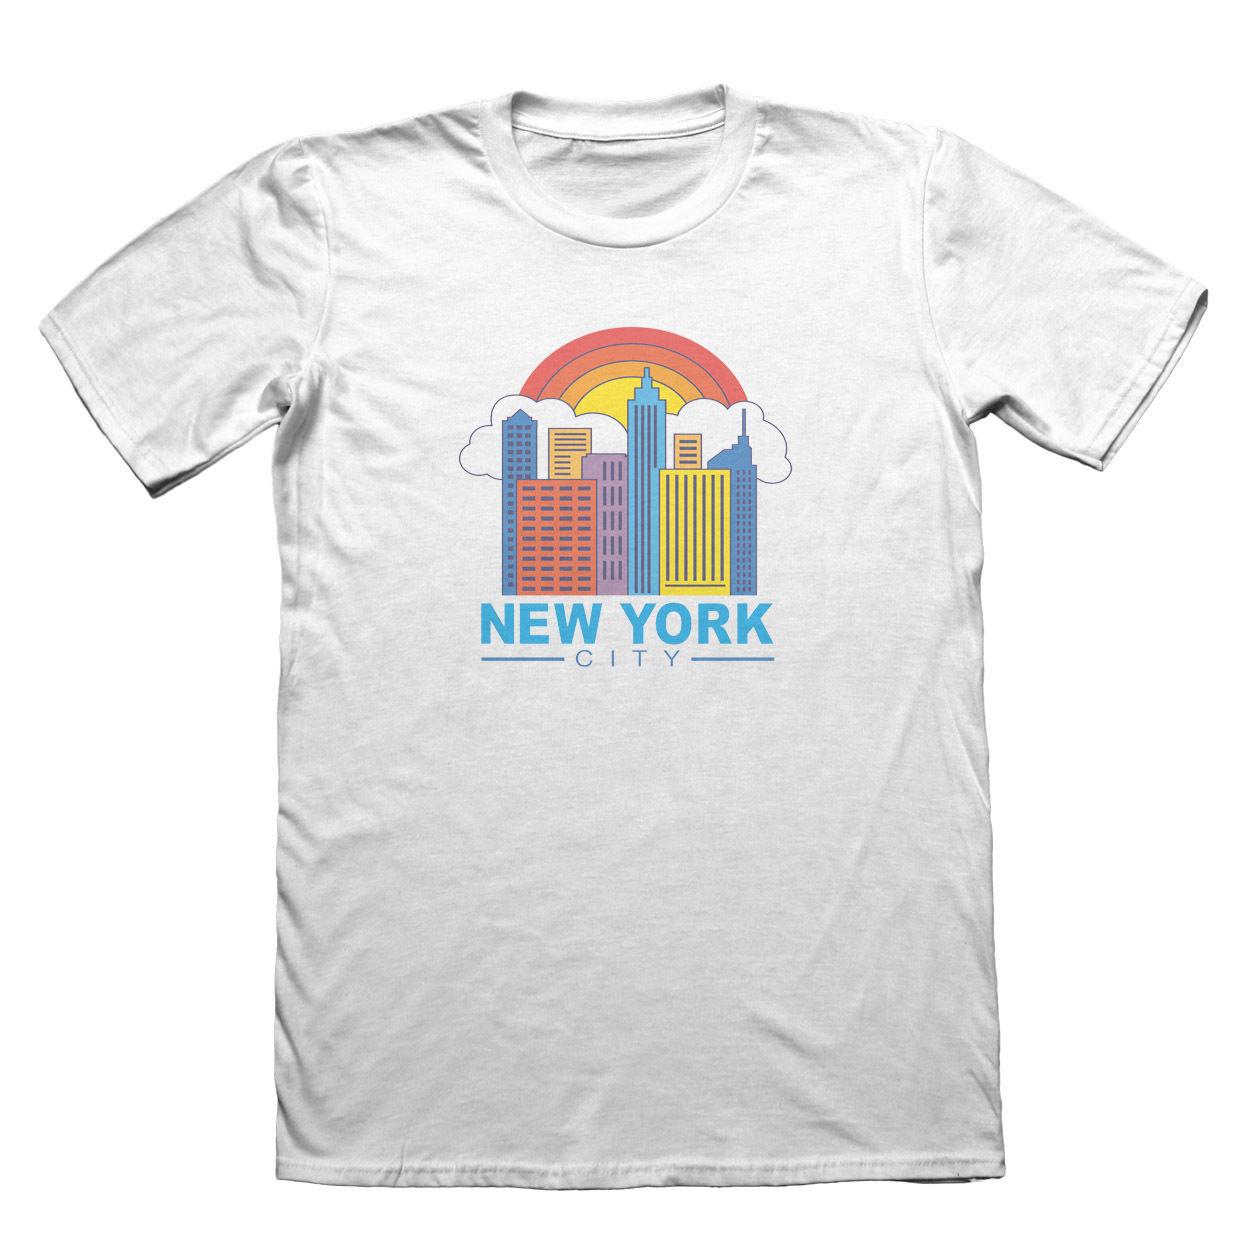 New York USA Design T-Shirt - Mens Fathers Day Christmas #9170